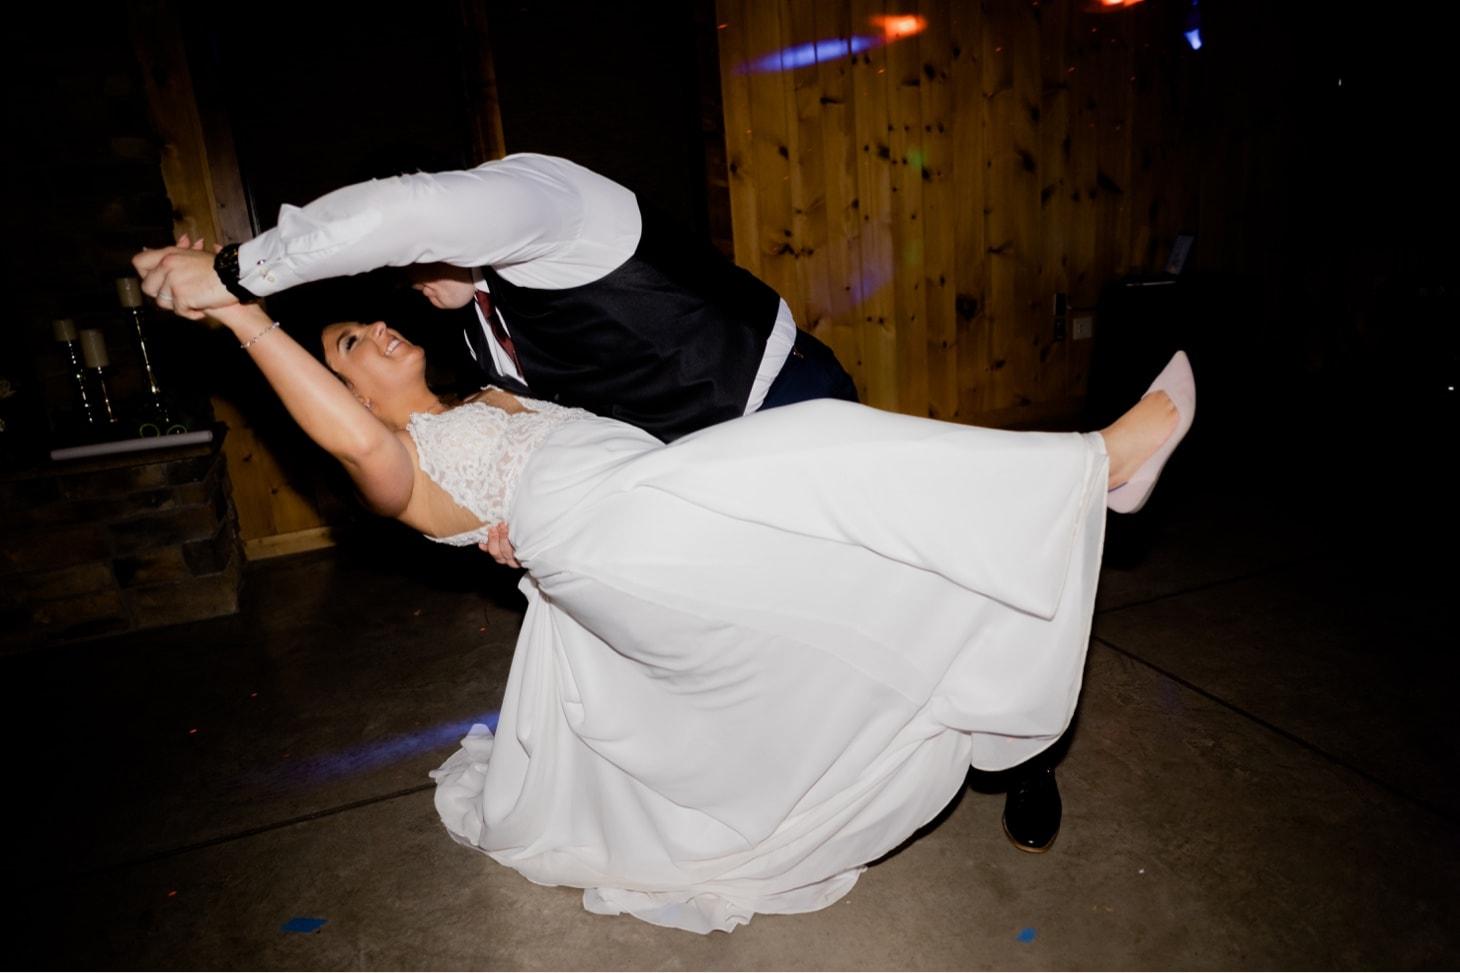 country lane lodge wedding dance